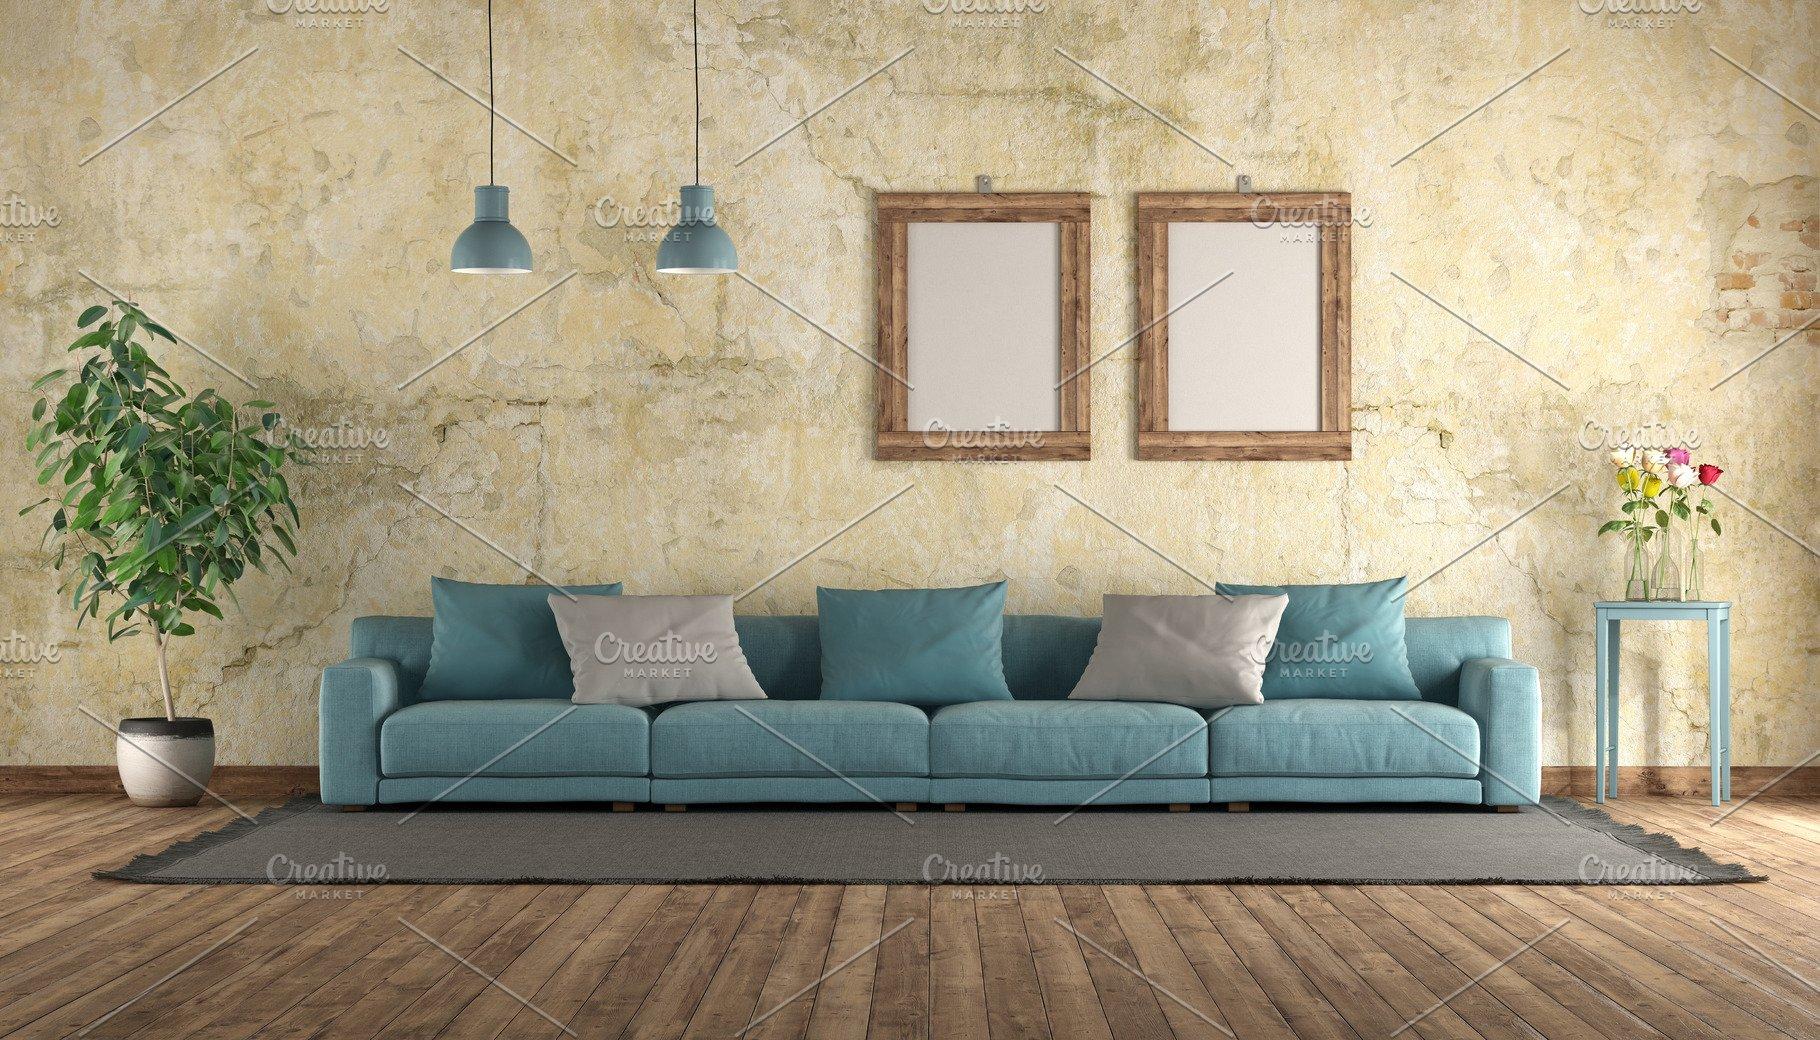 Modern blue sofa in a grunge room